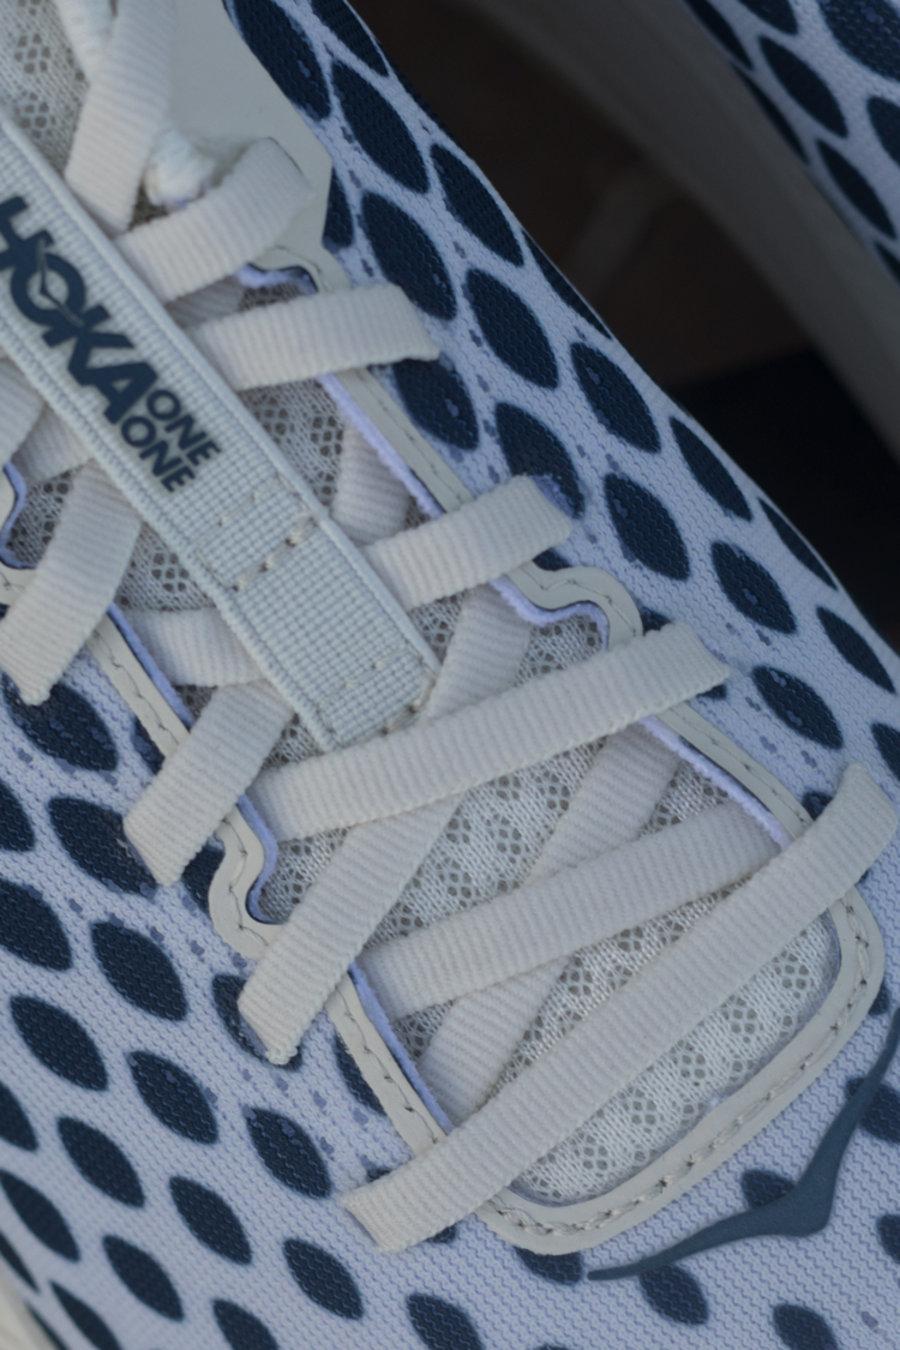 Clifton Edge,Clifton 7,Carbon  脚感爽到颤抖!增高还显腿细!这双宝藏新鞋现在还能买!